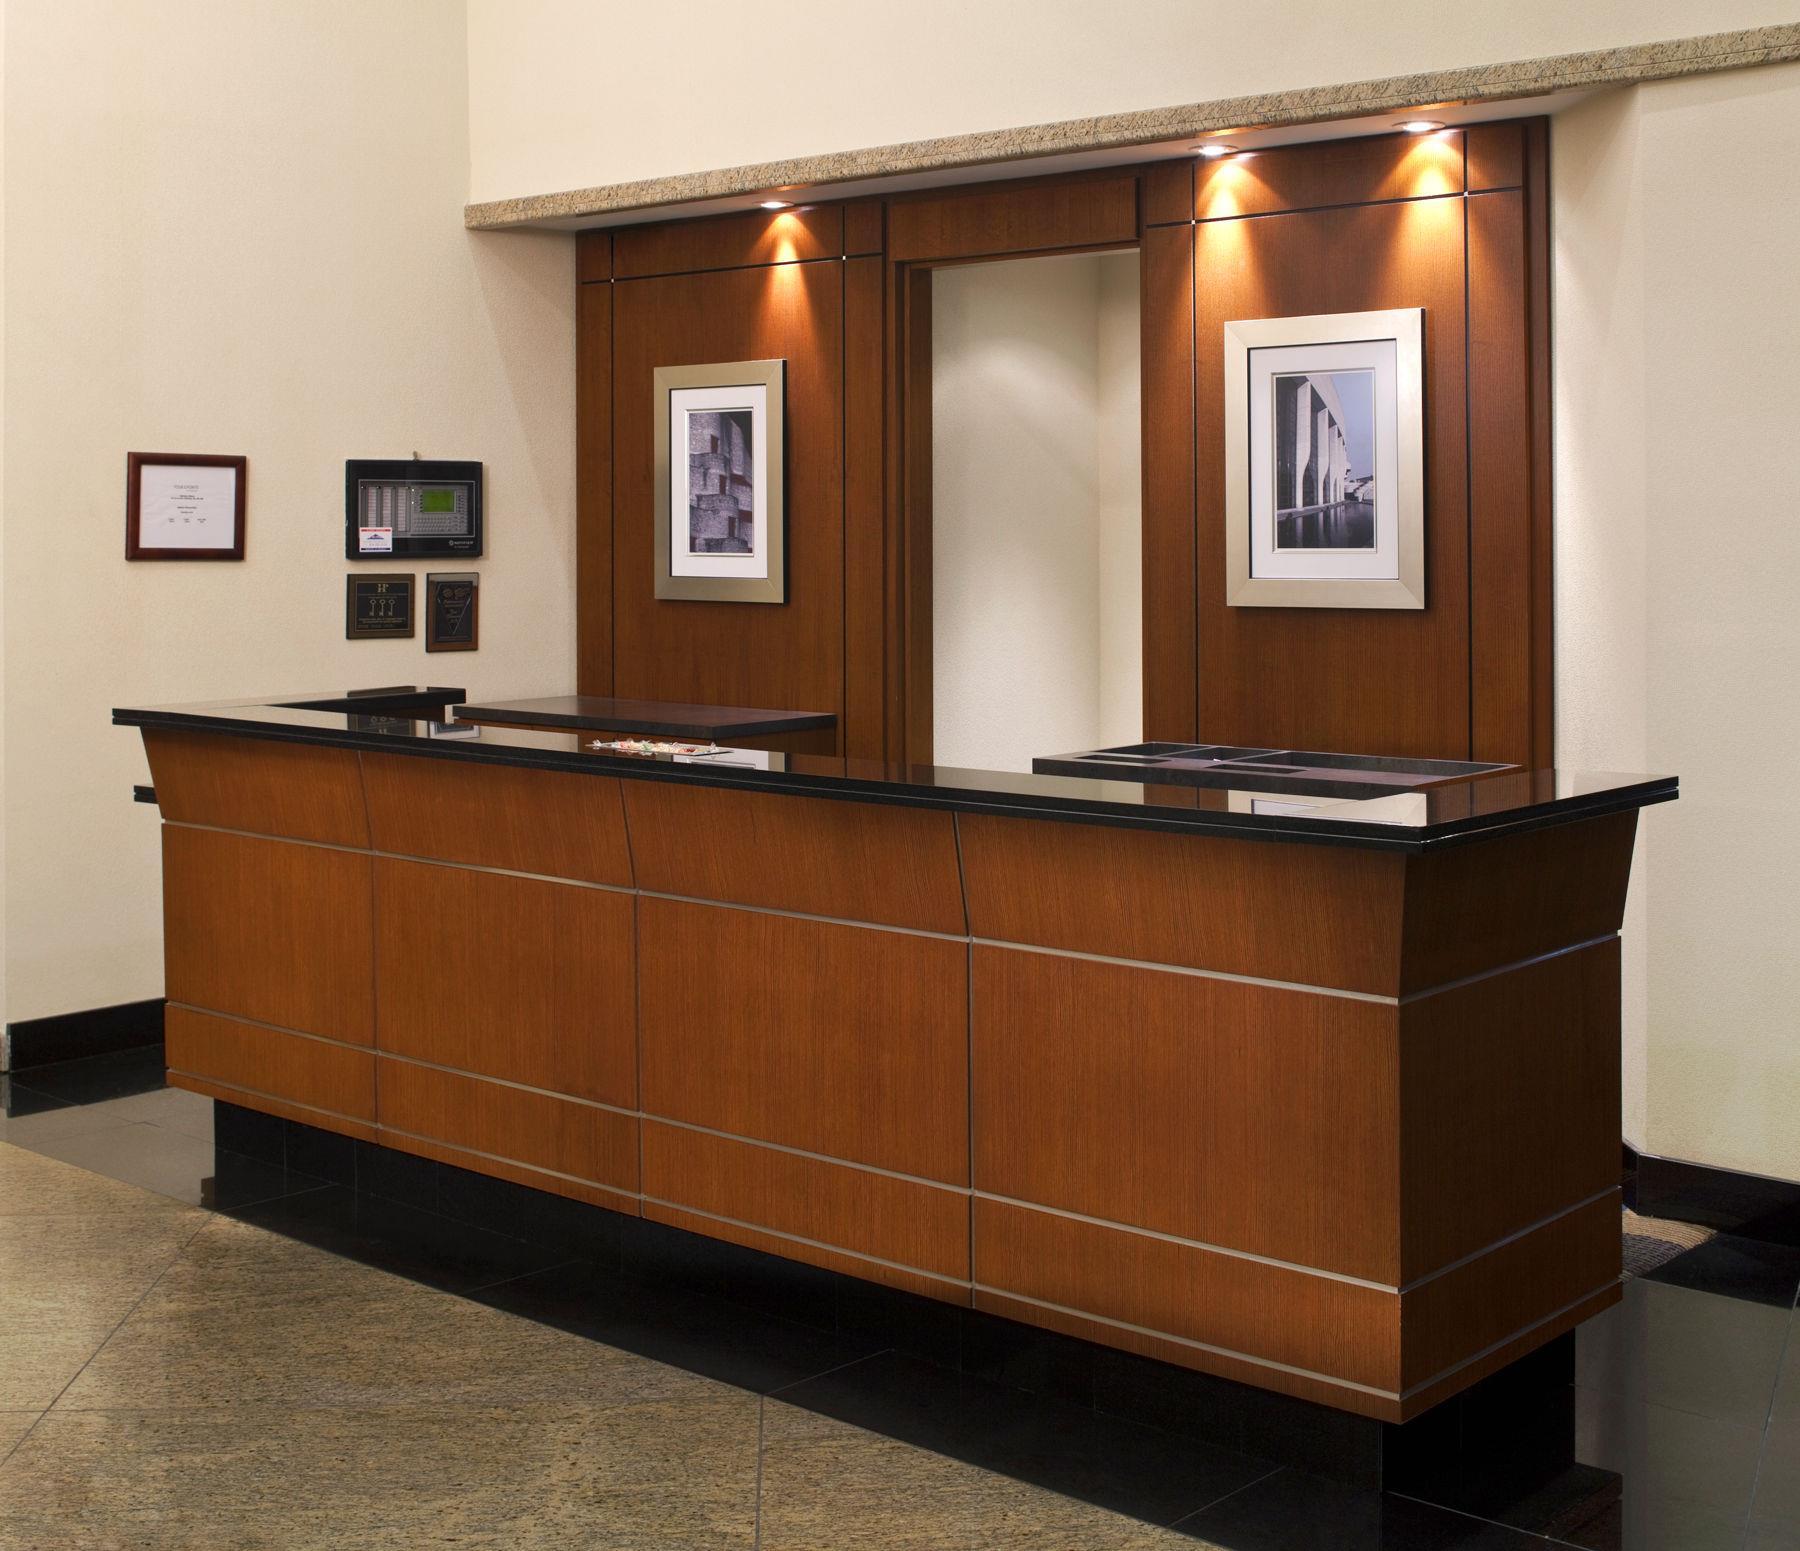 Four Points by Sheraton Hotel & Conference Centre Gatineau-Ottawa à Gatineau: Front desk